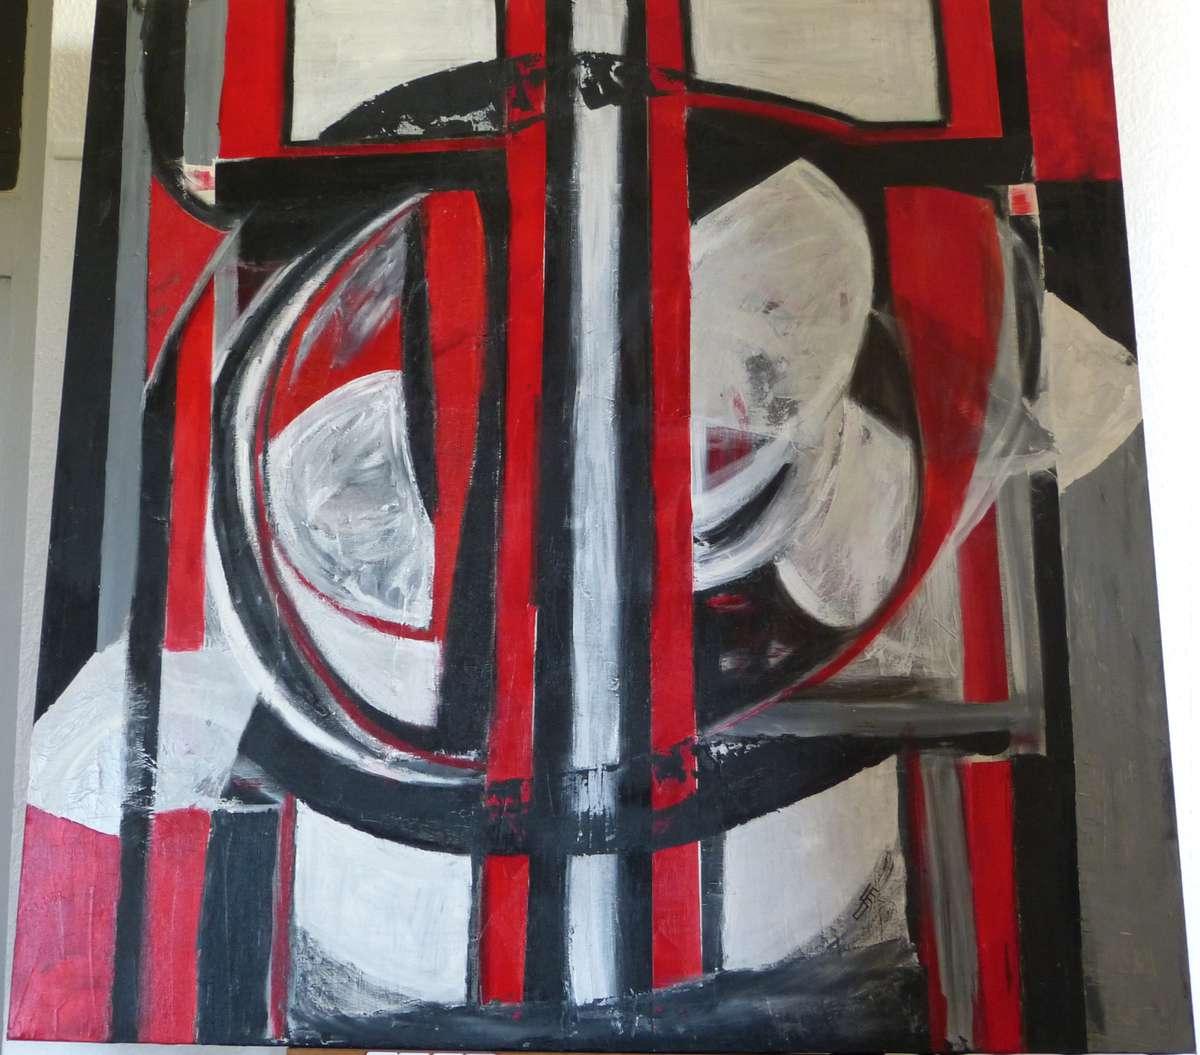 dimartino florence ar nes acrylique au couteau 100x100 cm. Black Bedroom Furniture Sets. Home Design Ideas